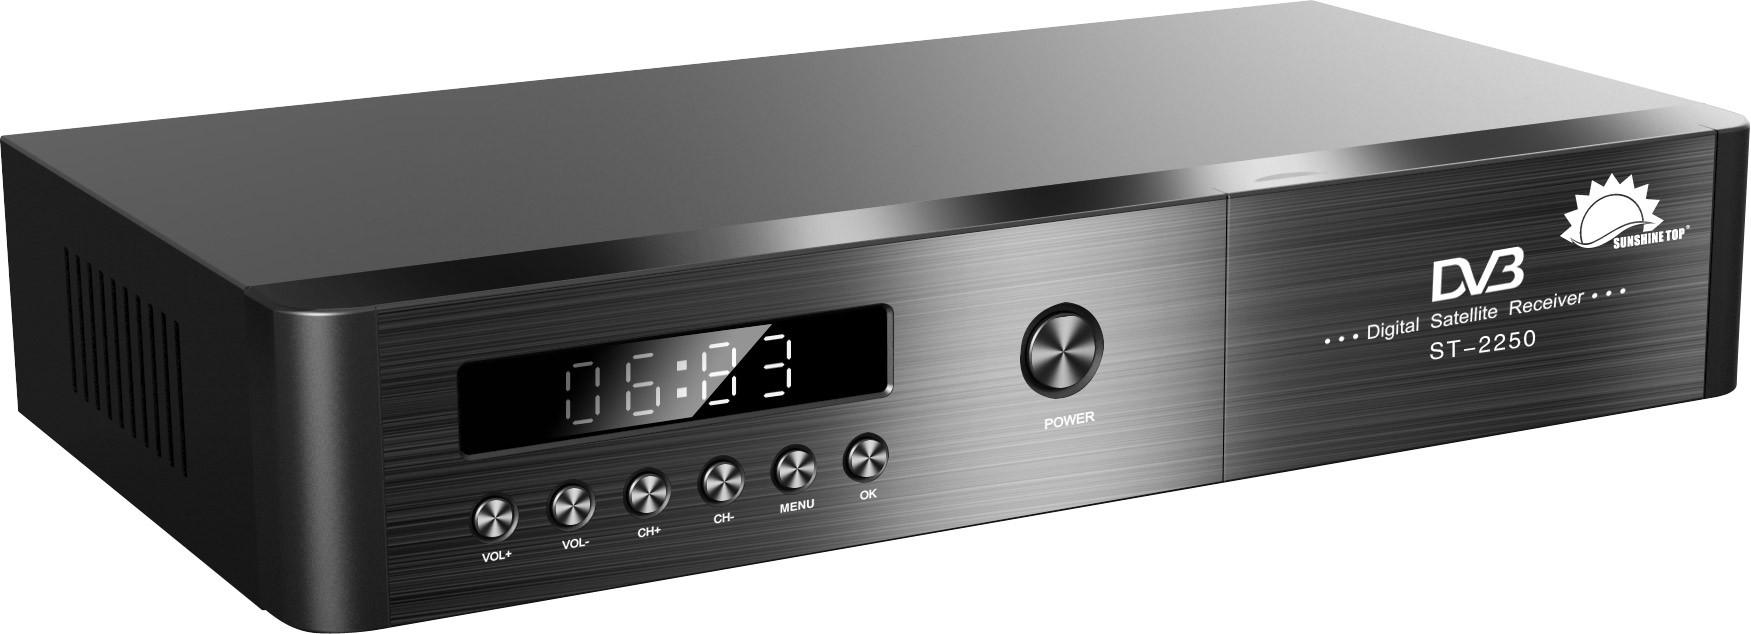 high Quality New FTA HD decoder DVB S2 Set Top Box | SUNSHINE TOP